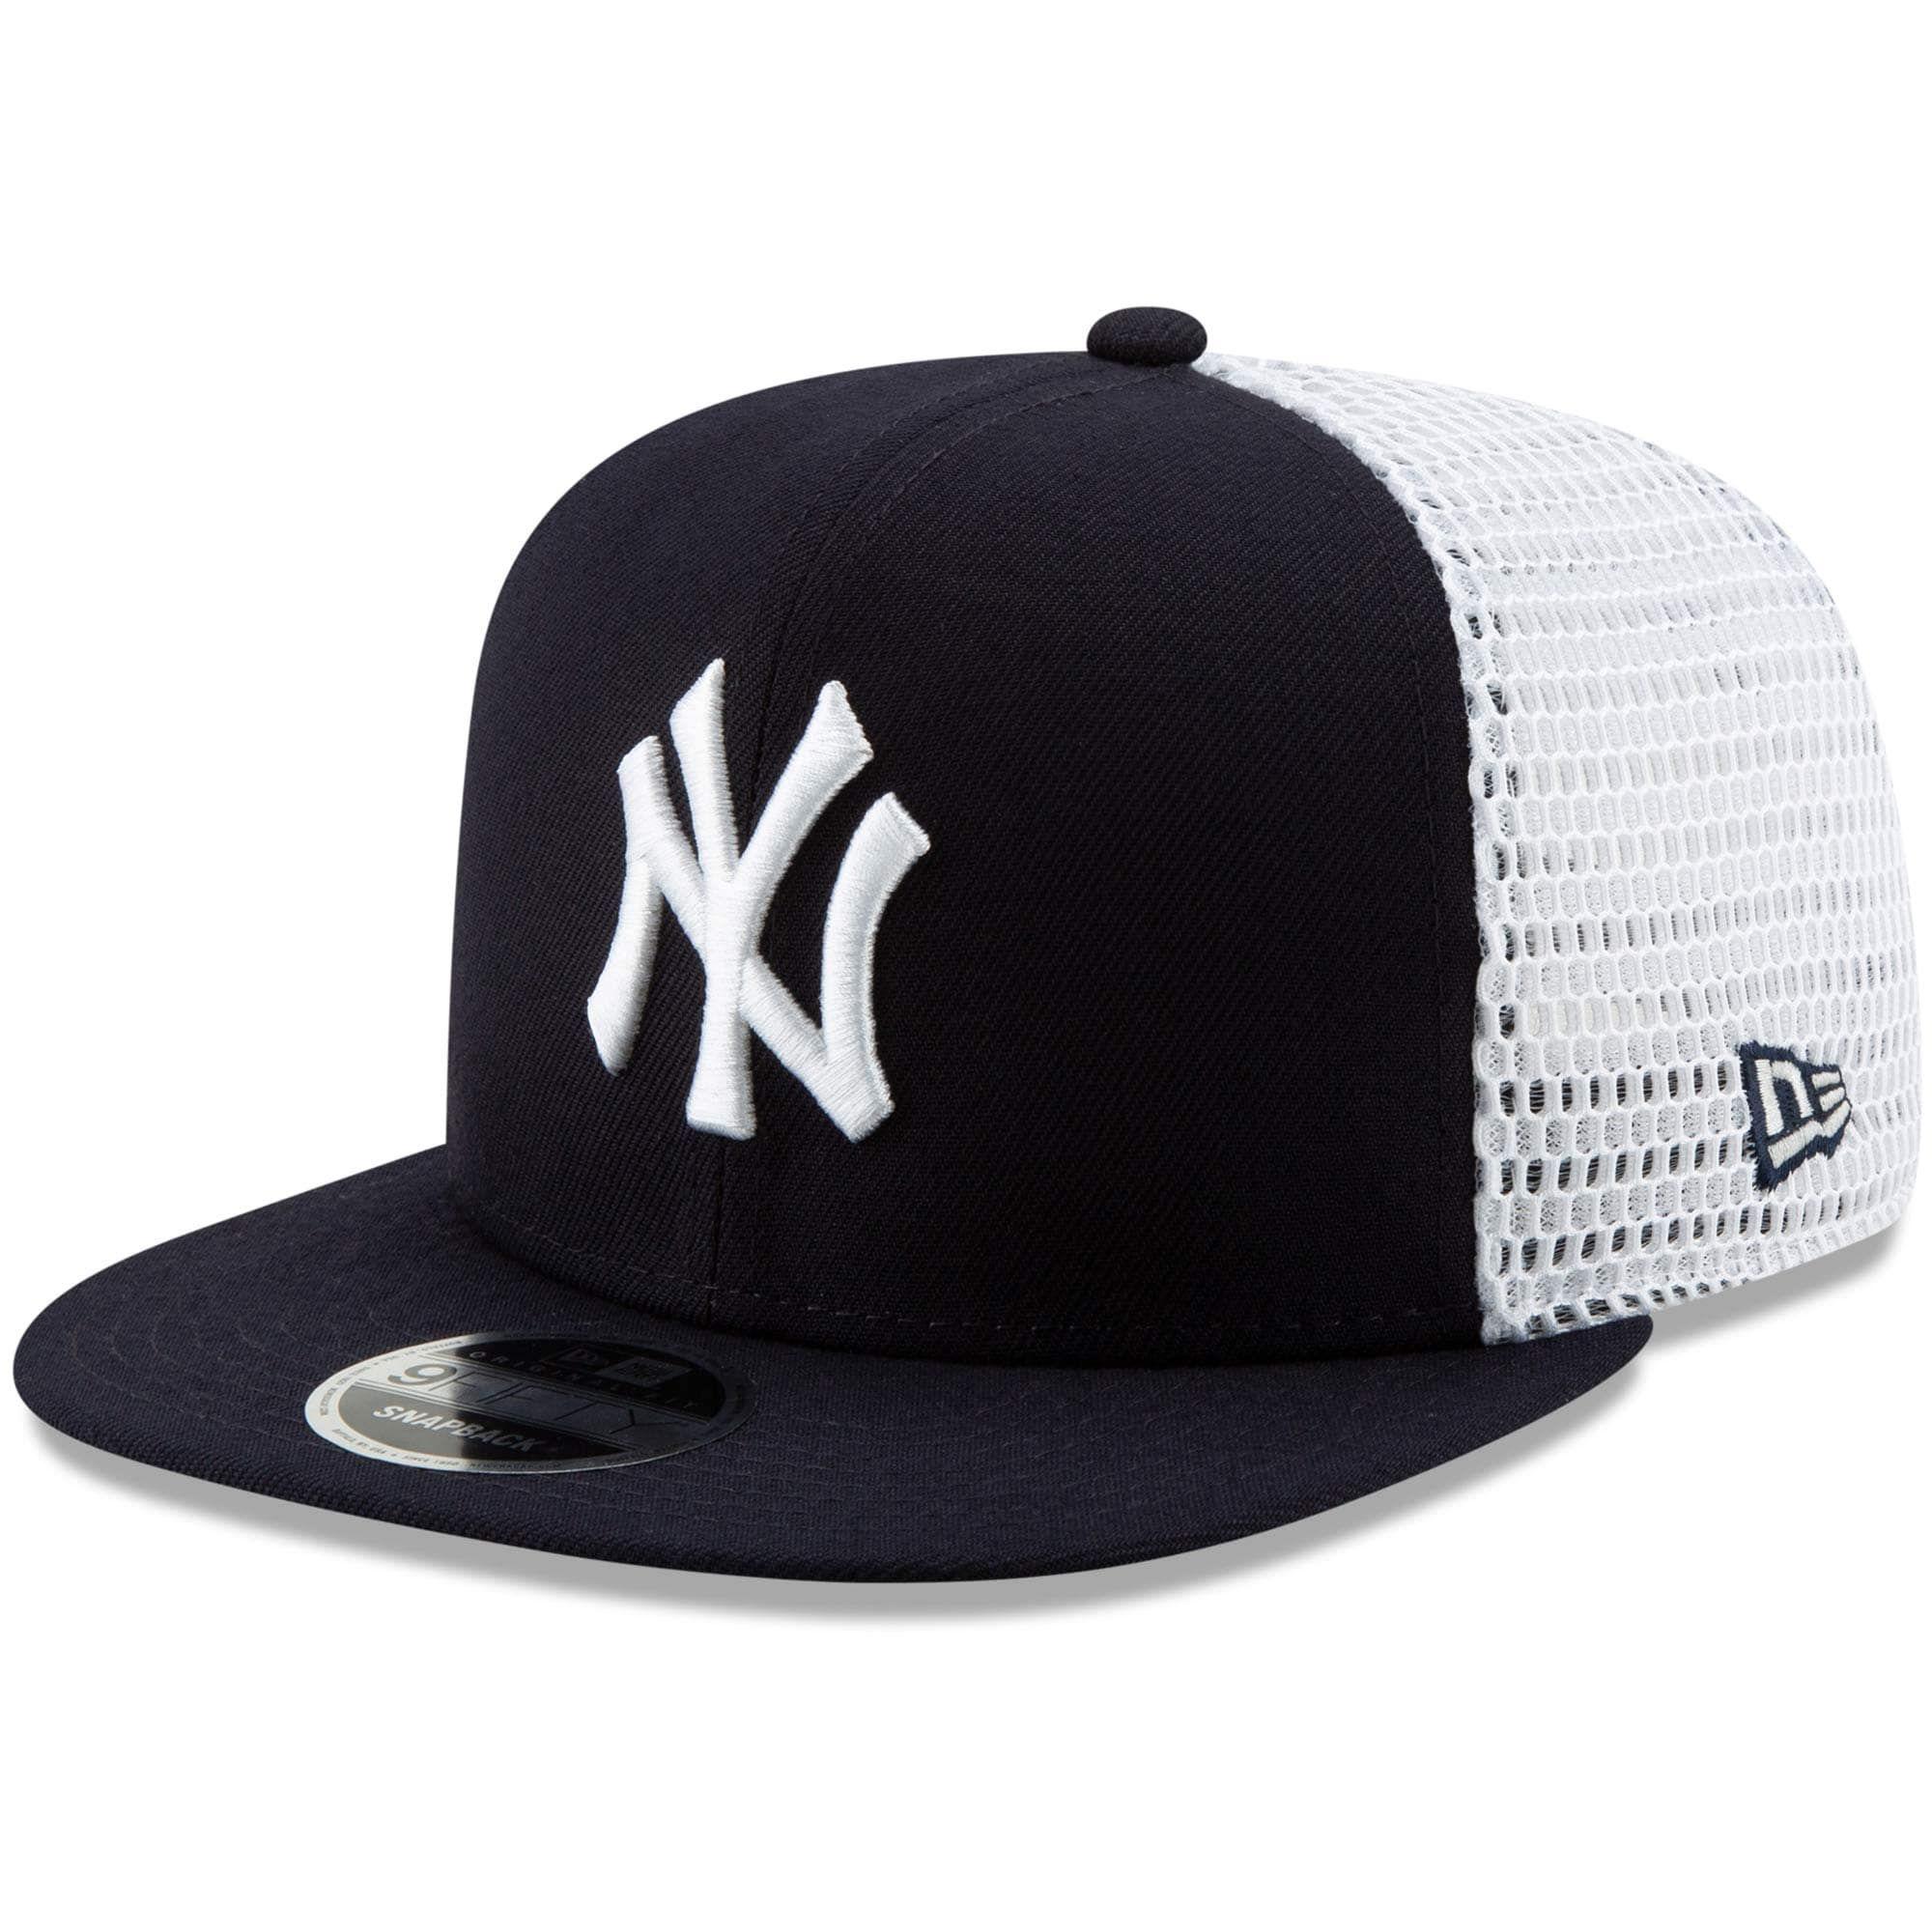 New York Yankees New Era Mesh Fresh 9fifty Adjustable Snapback Hat Navy White In 2020 Snapback Hats New York Yankees Hats